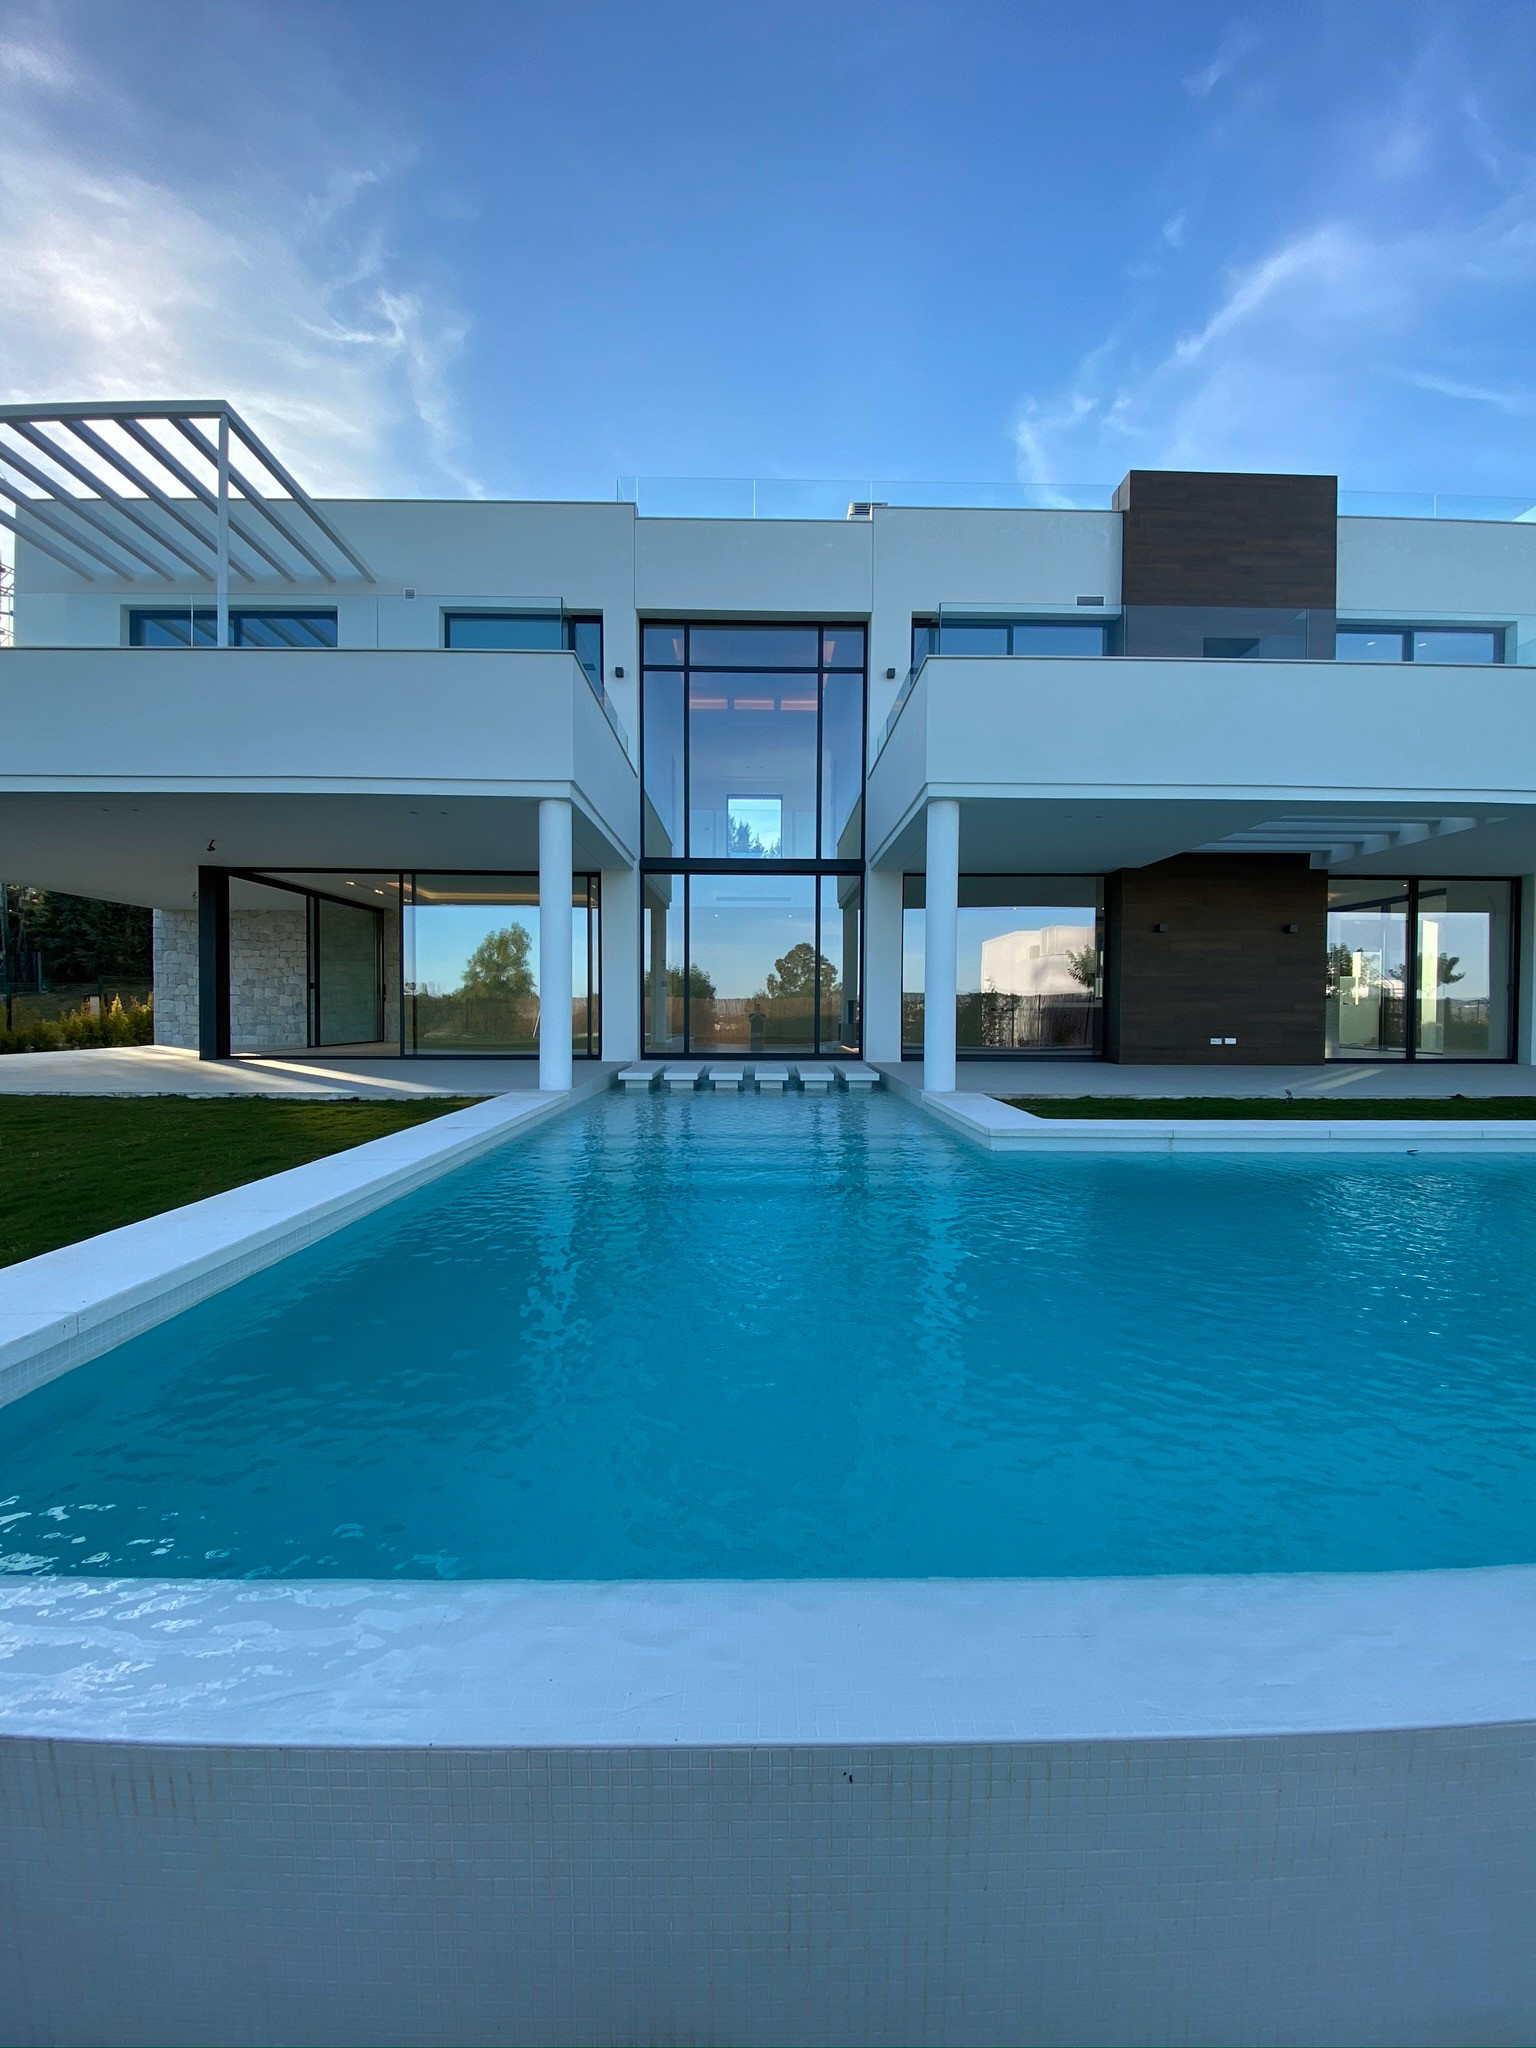 property for sale in la quinta